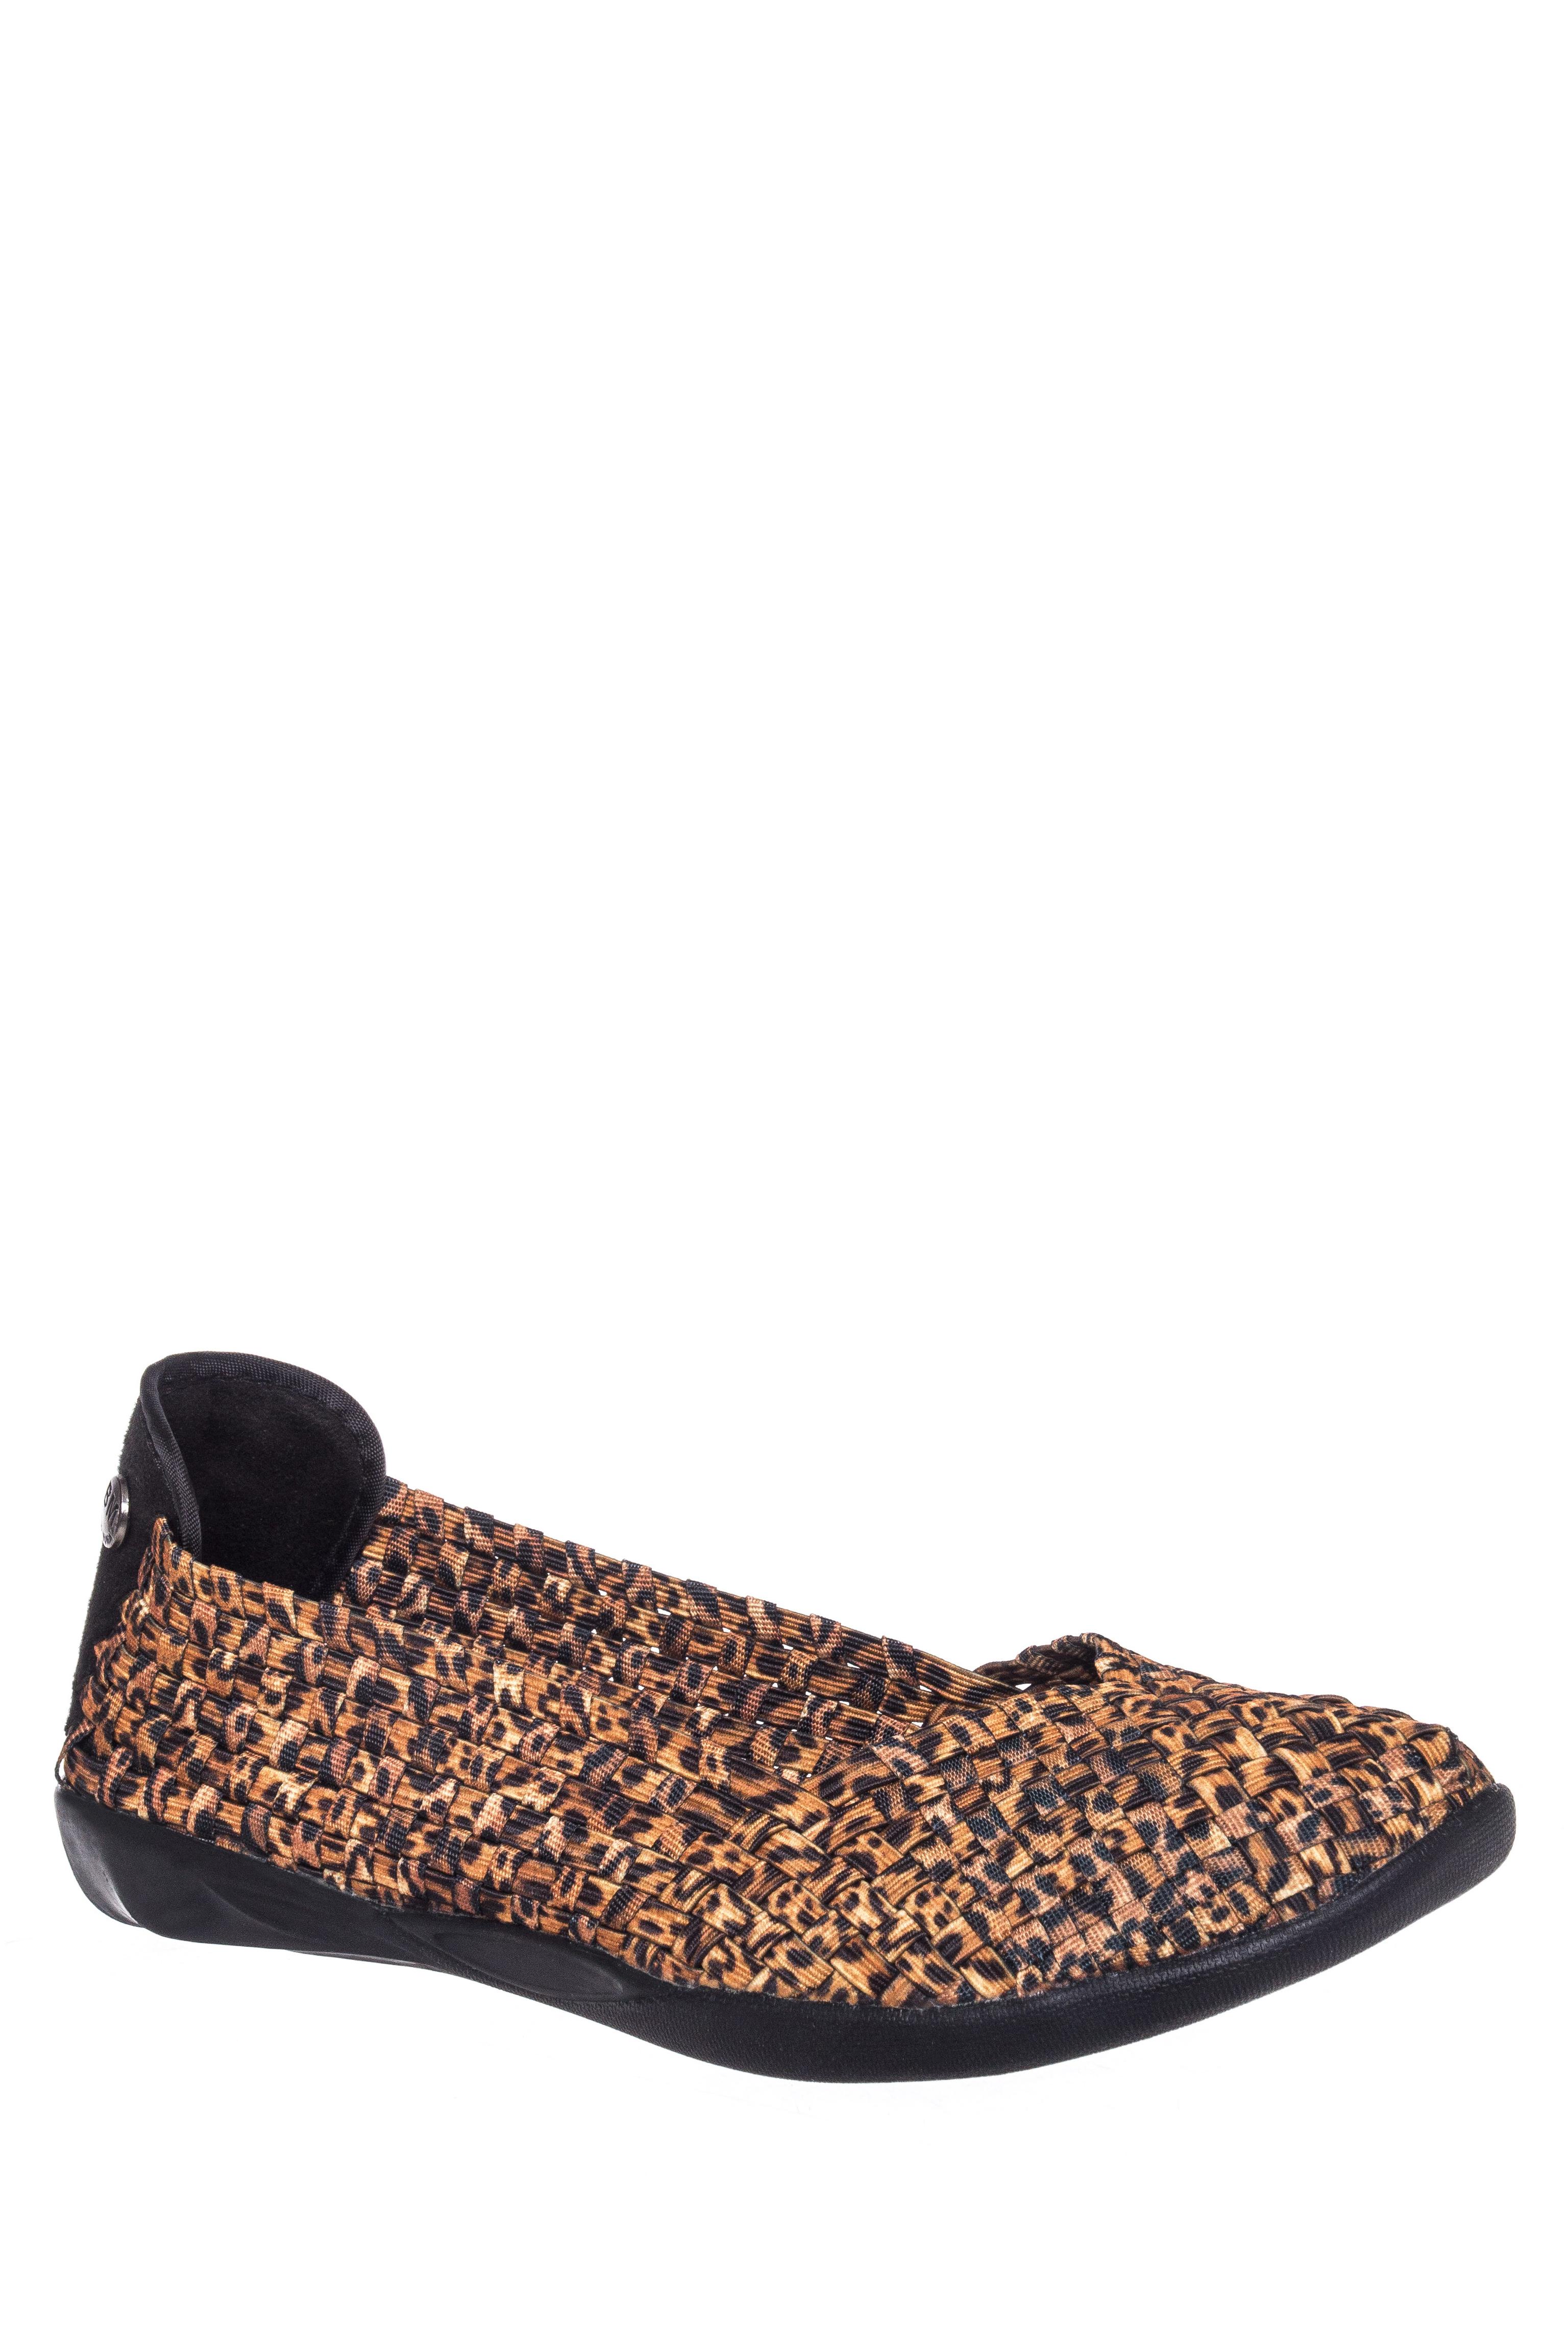 Bernie Mev Catwalk Comfort Flats - Leopard